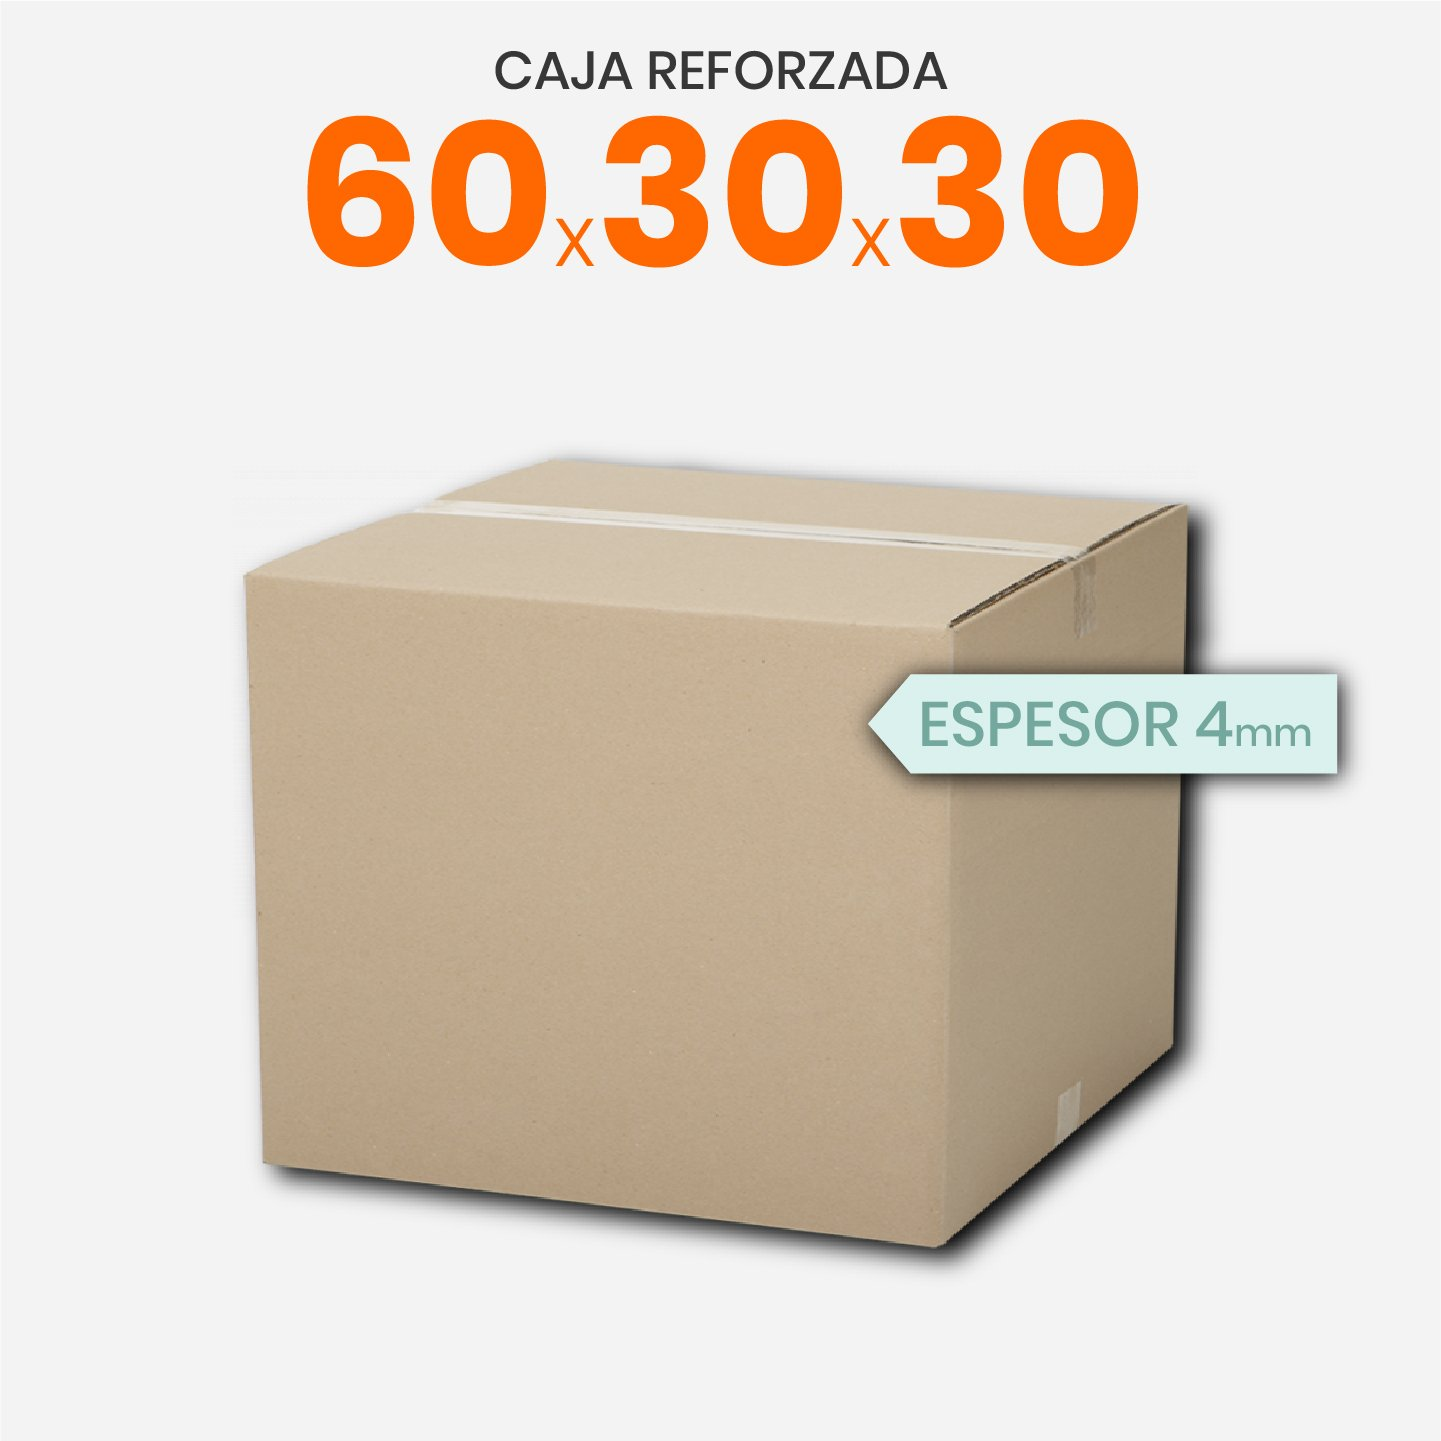 Caja De Cartón Corrugado 60x30x30 4mm